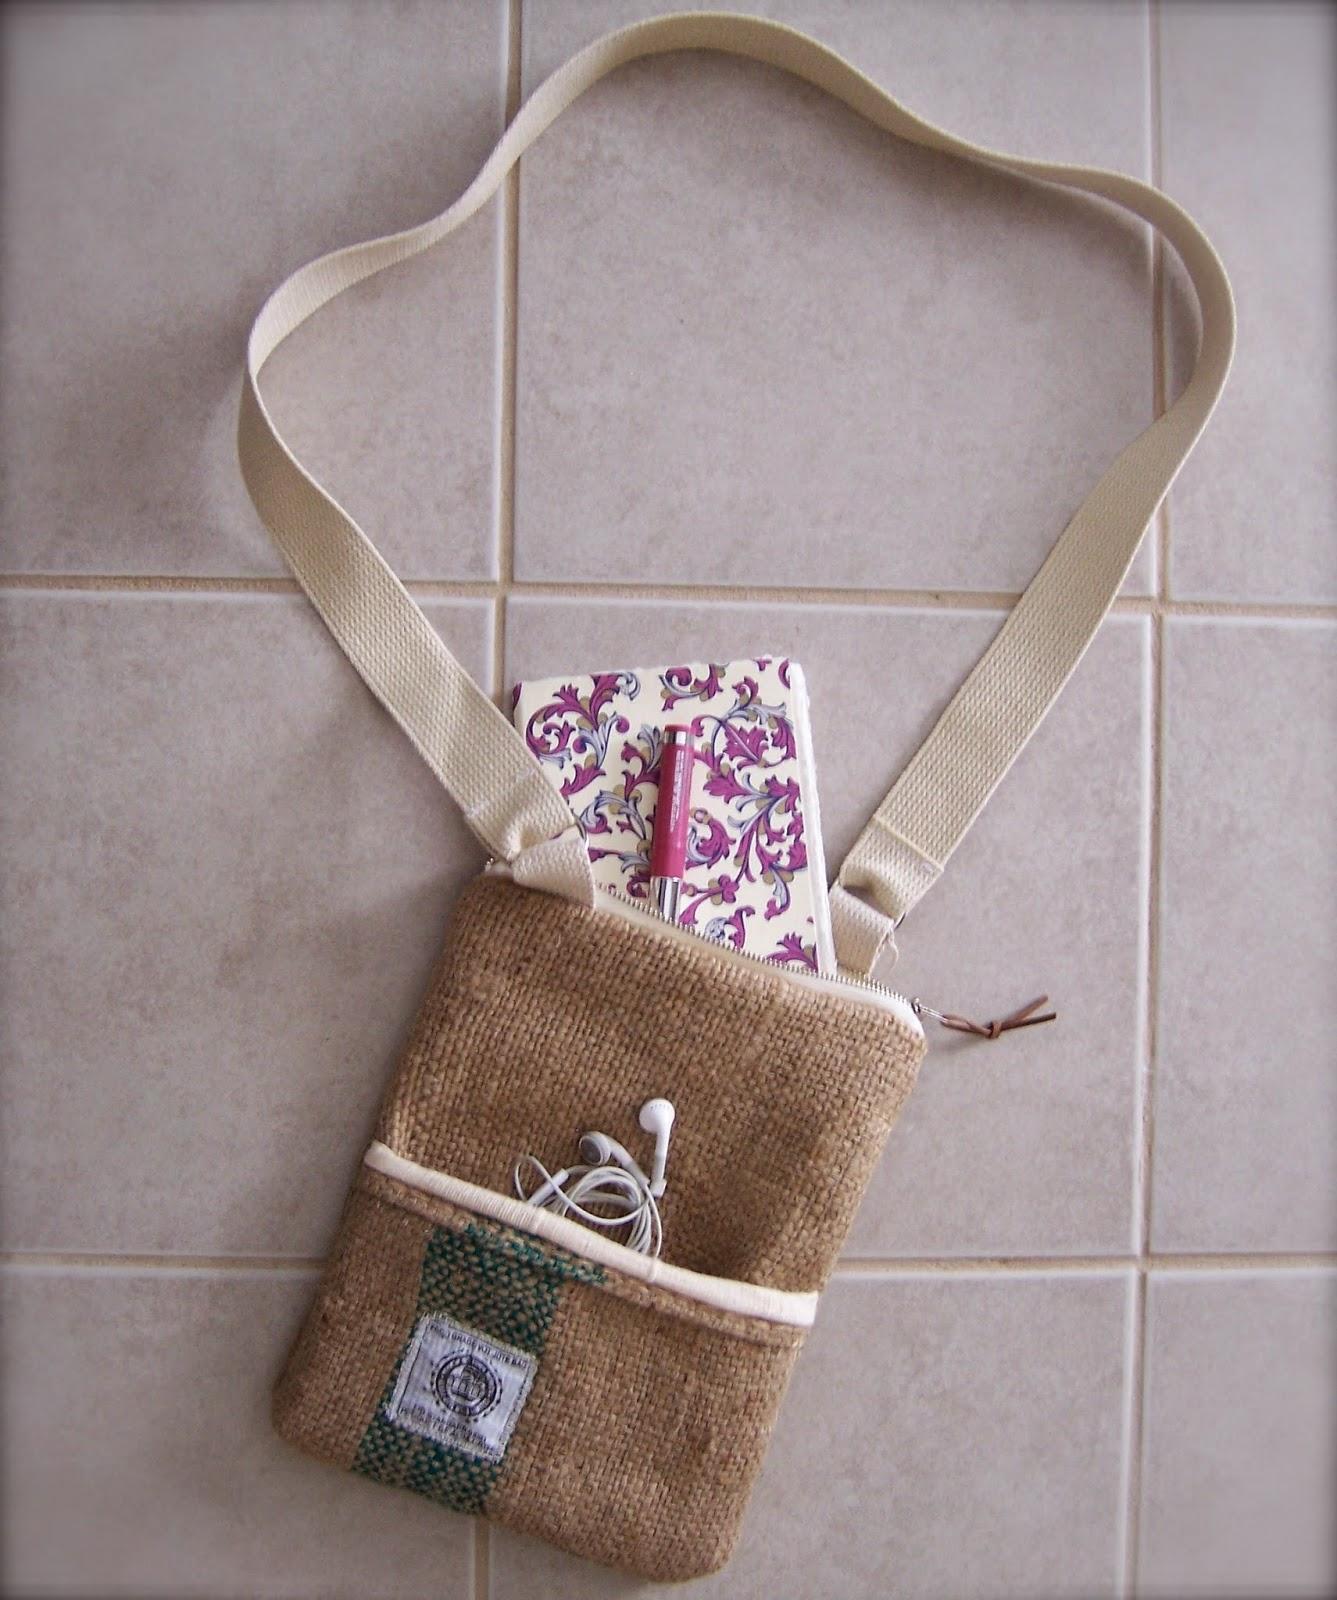 Jute Mills burlap bag - linaandvi.blogspot.com - Plymouth MI